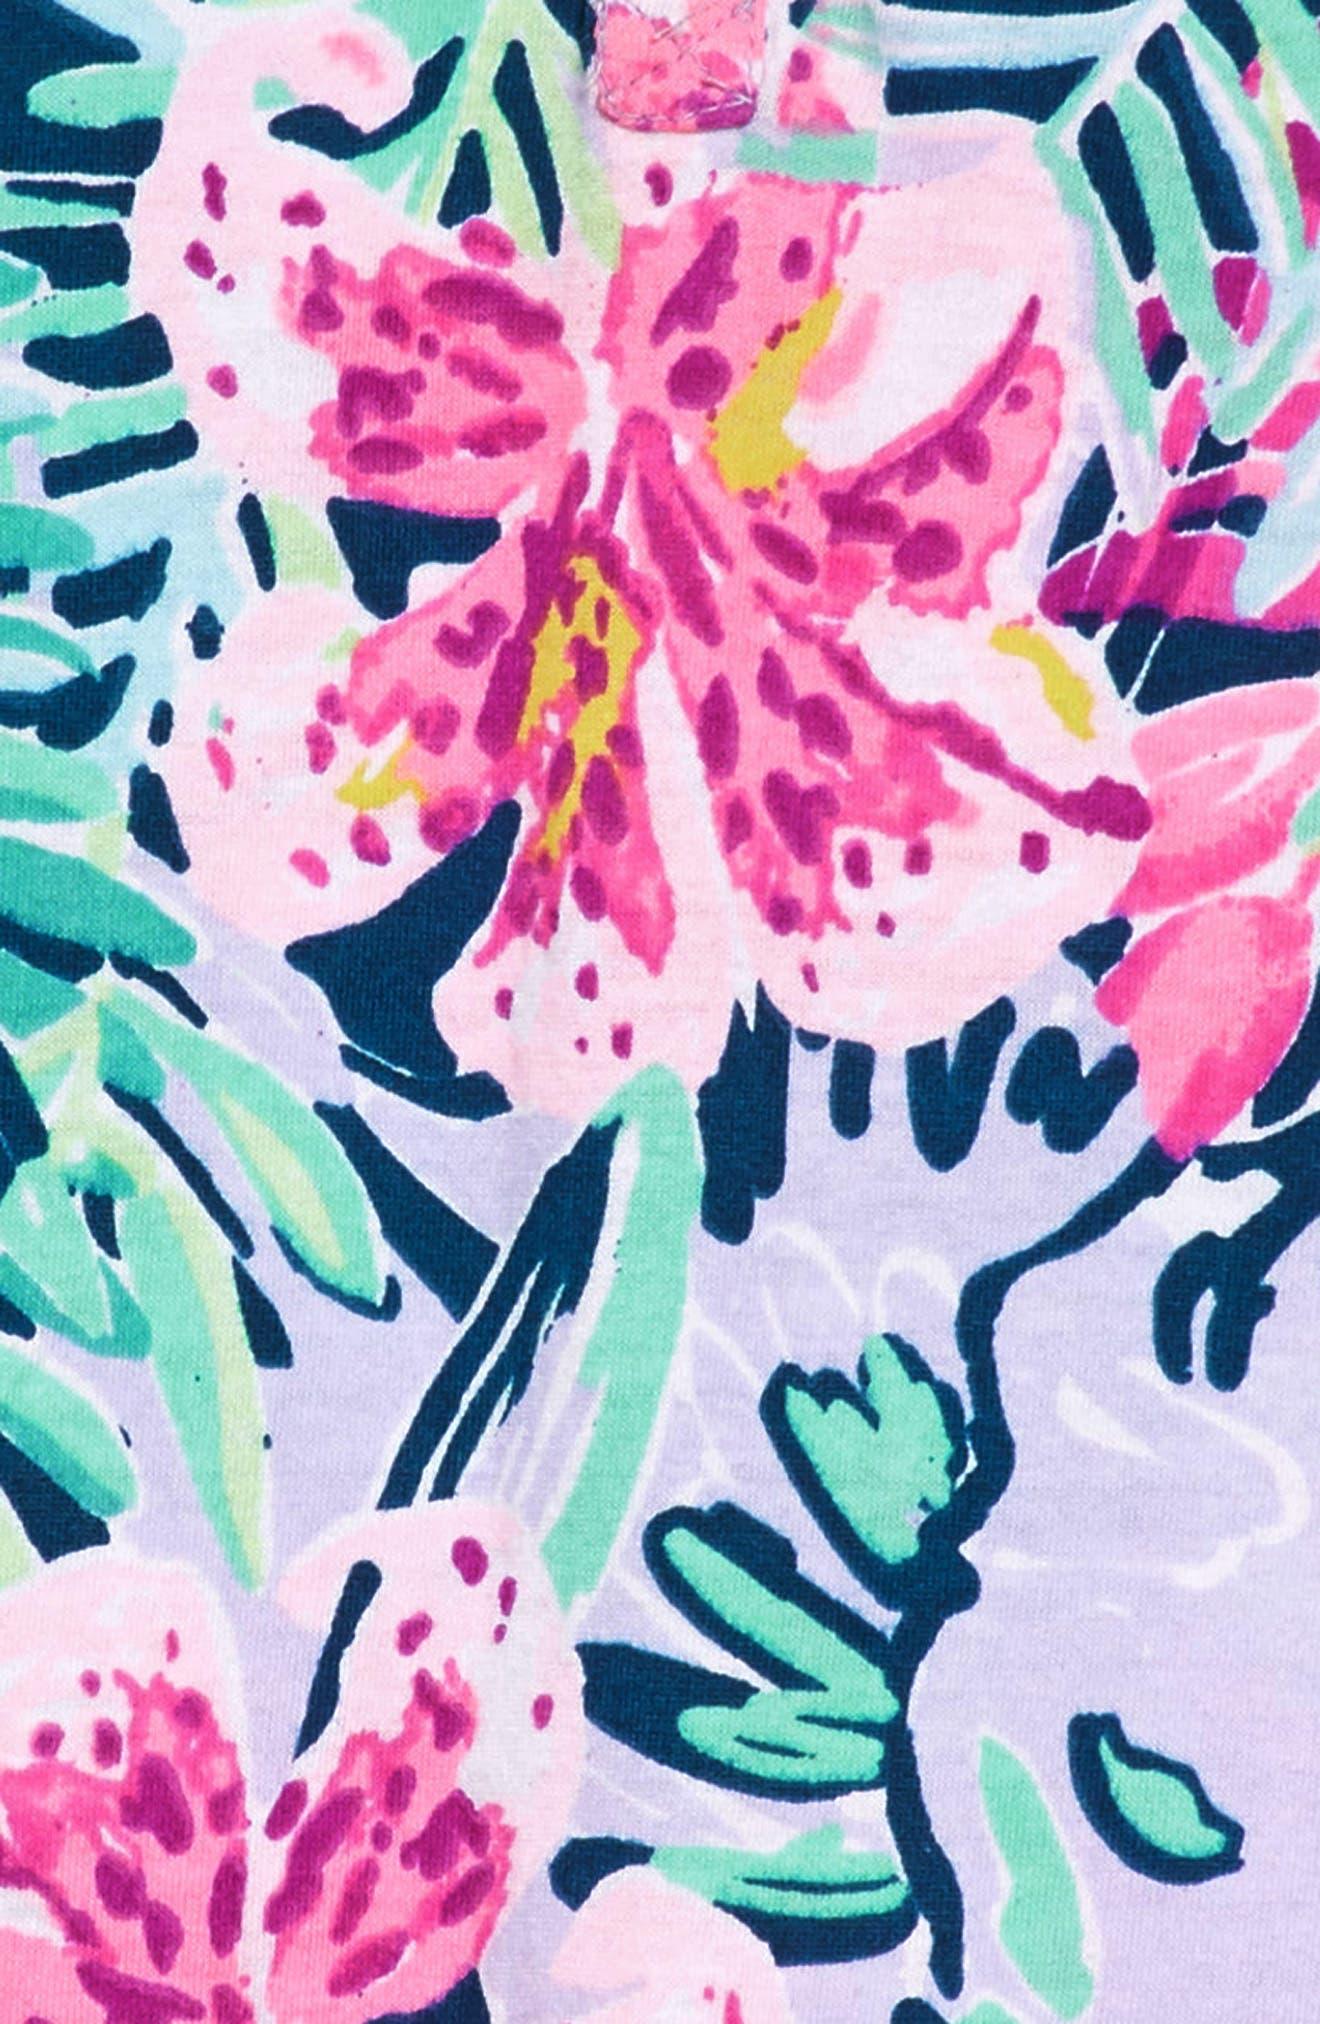 Mini Essie Shift Dress,                             Alternate thumbnail 3, color,                             MULTI SLATHOUSE SOIREE